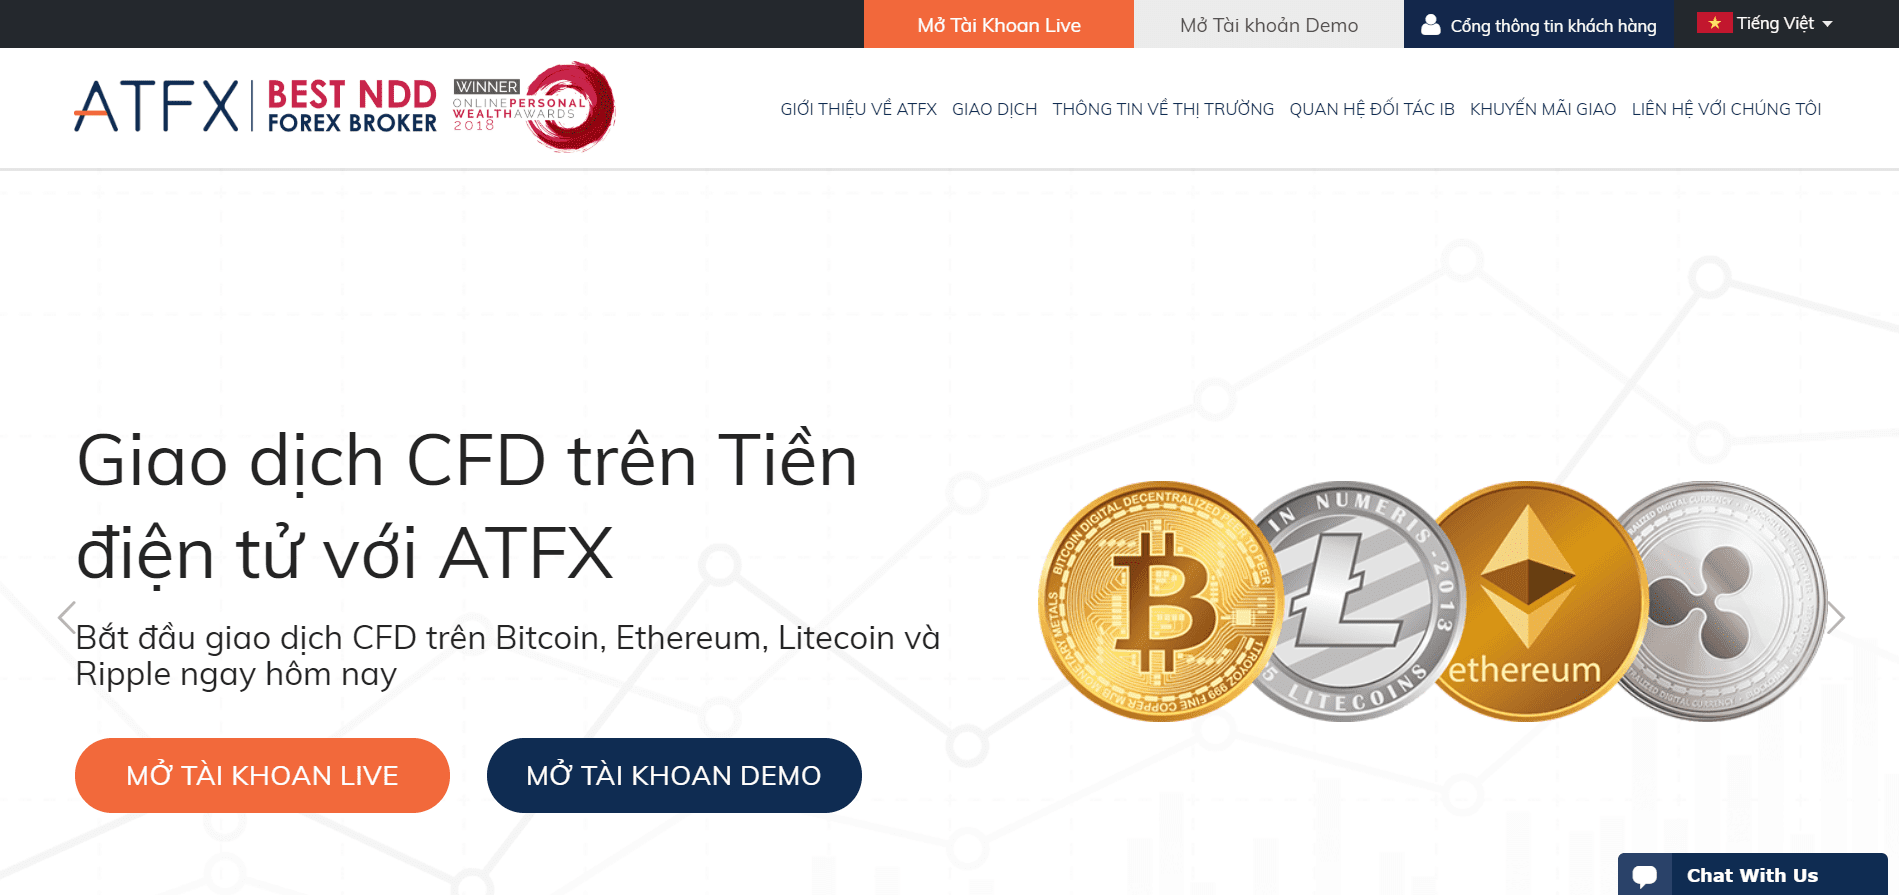 atfx vietnamese